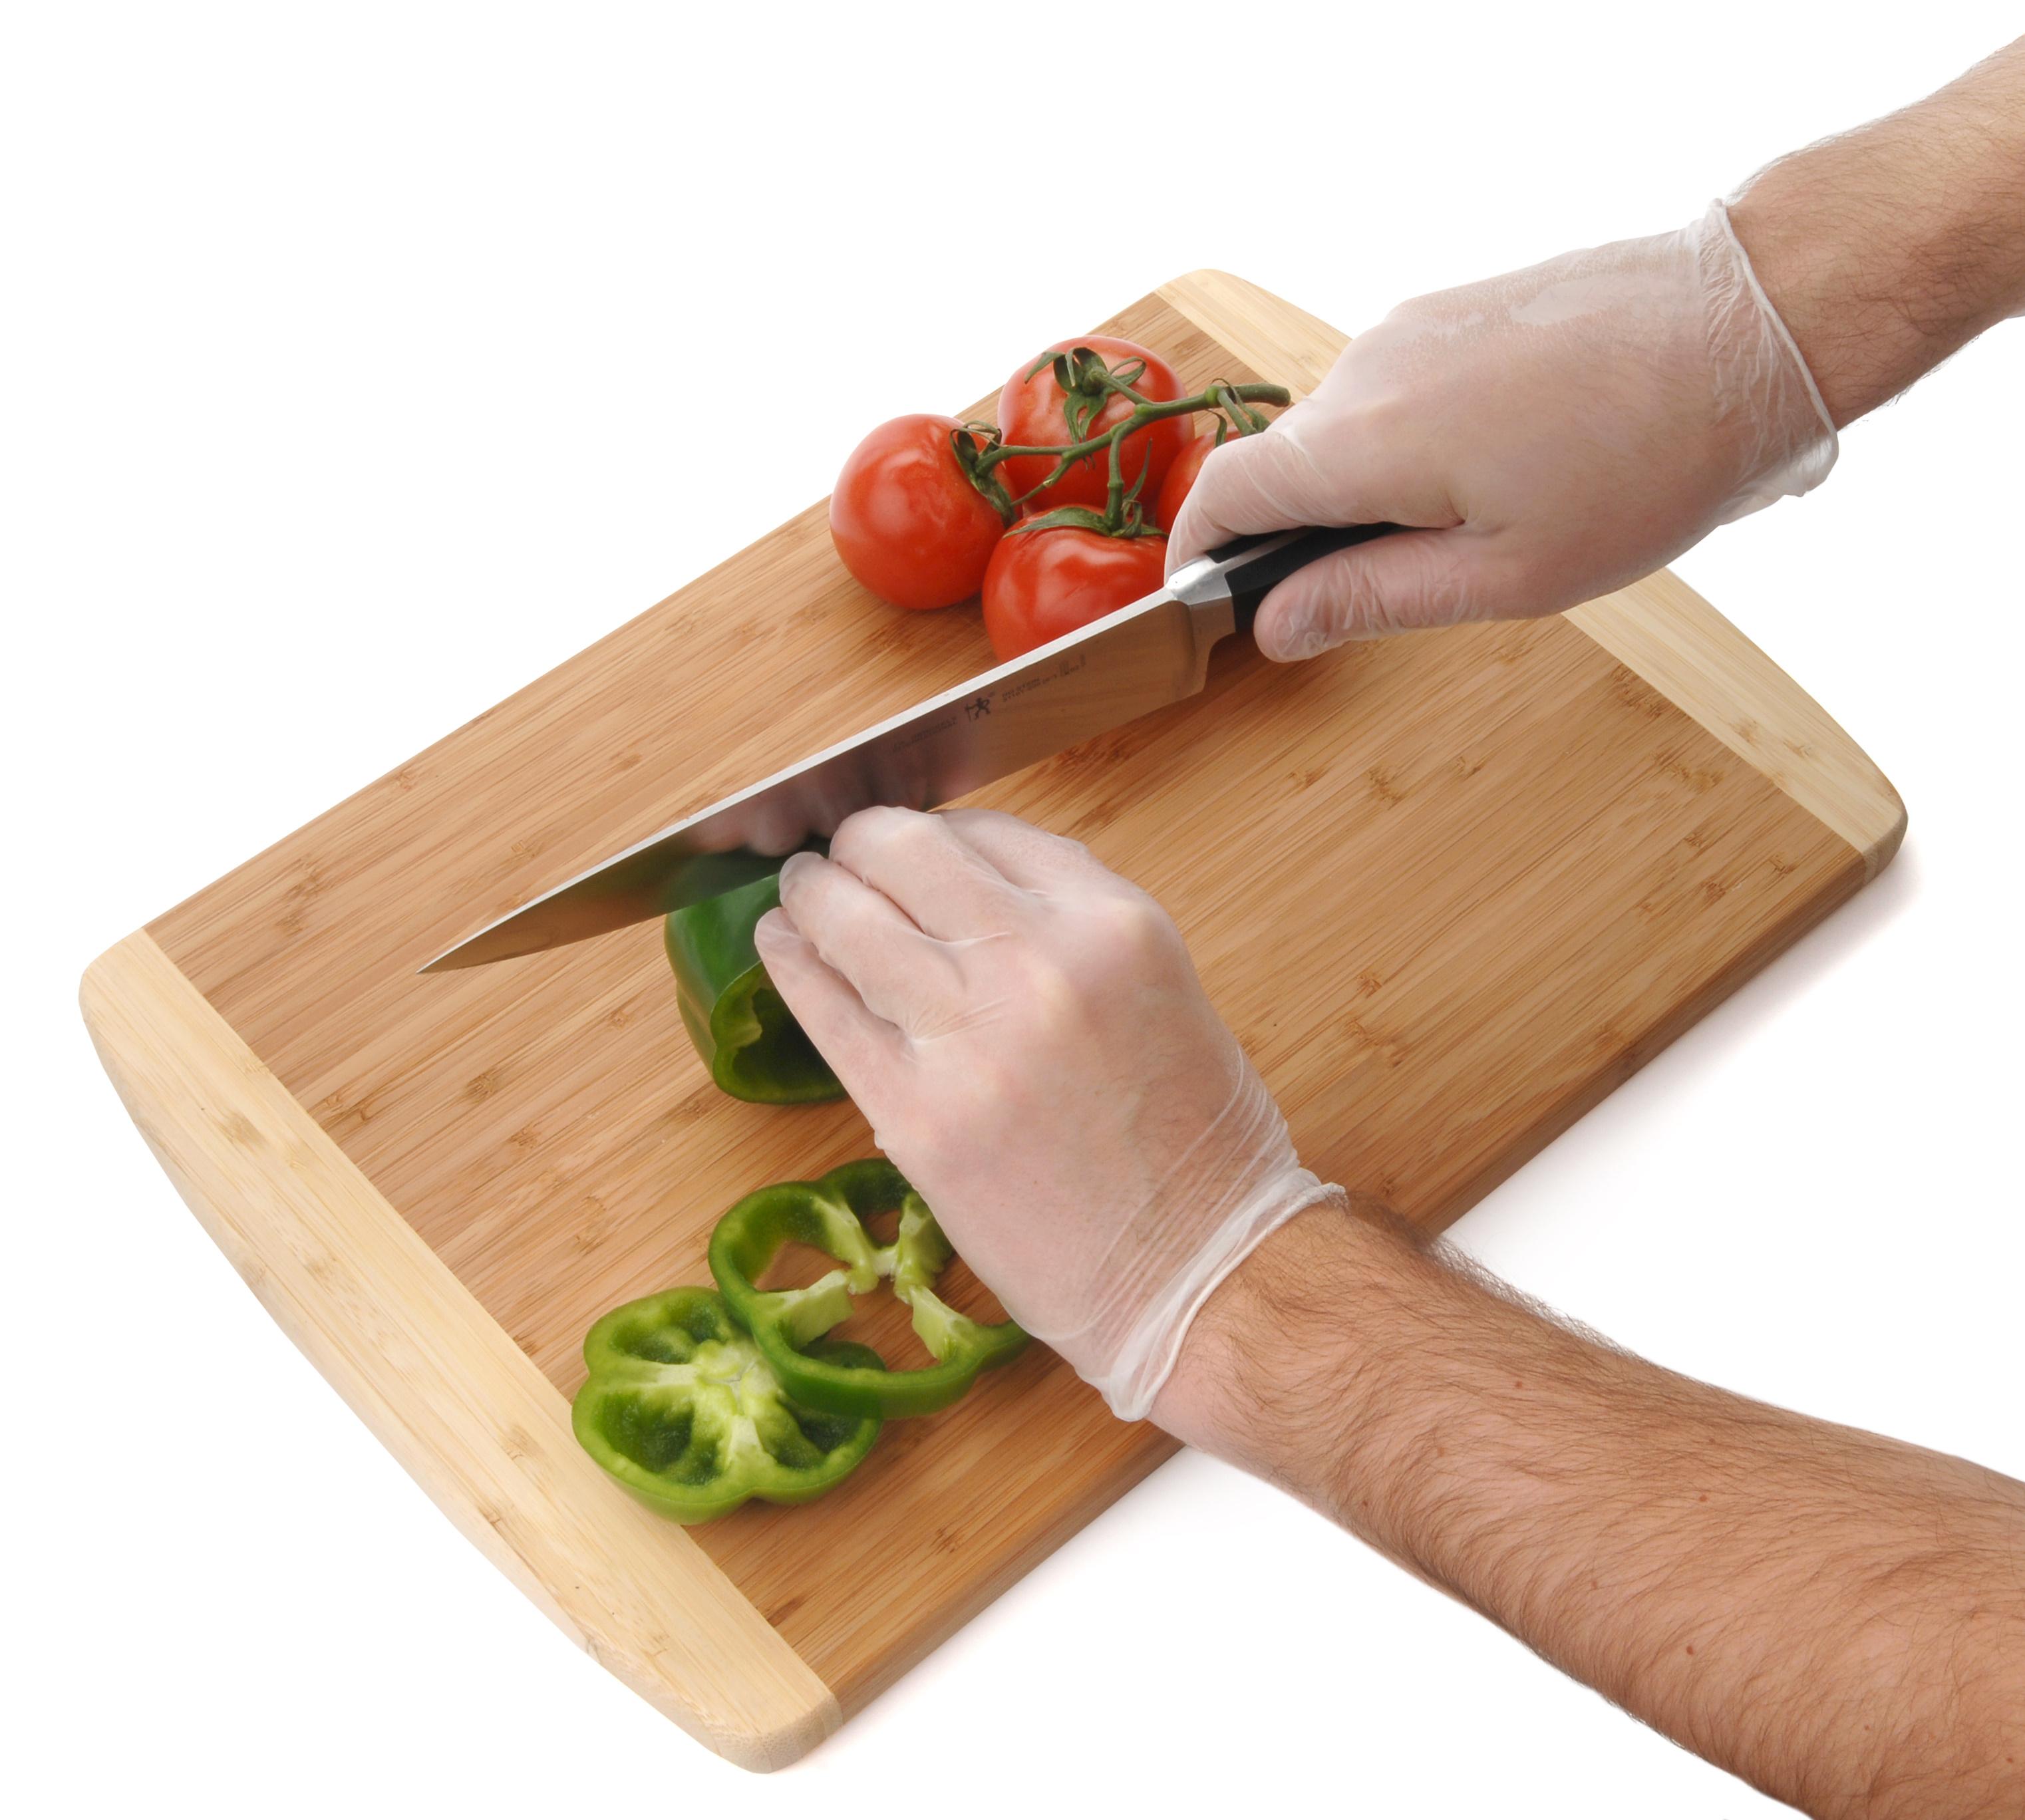 Gourmet Gloves Launch New Dop Dehp Free Food Service Hand